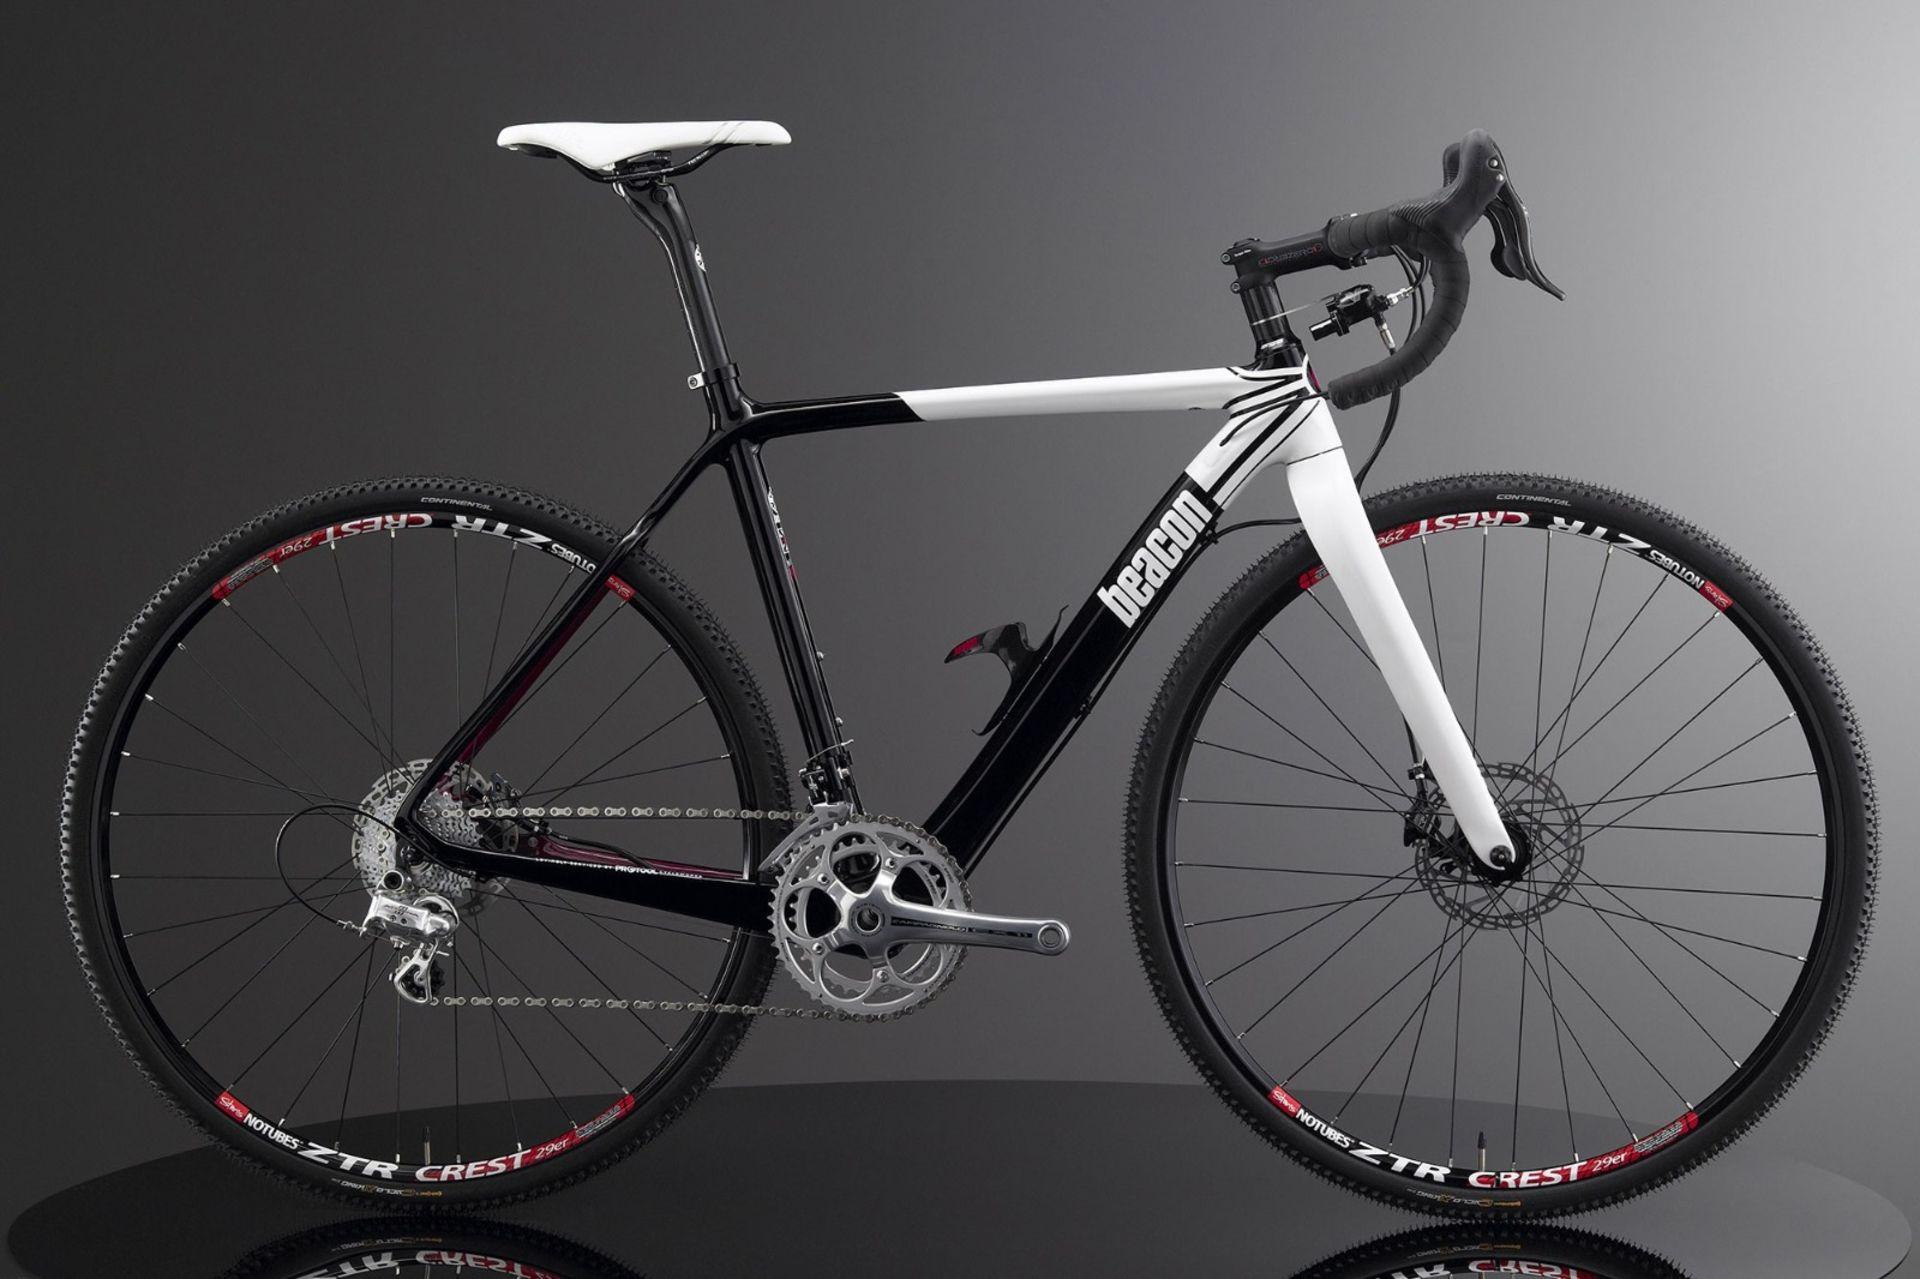 Lot 12 - 1 x Beacon Model BF-45, Size 540, Carbon Fibre Bike Frame in Black & White.